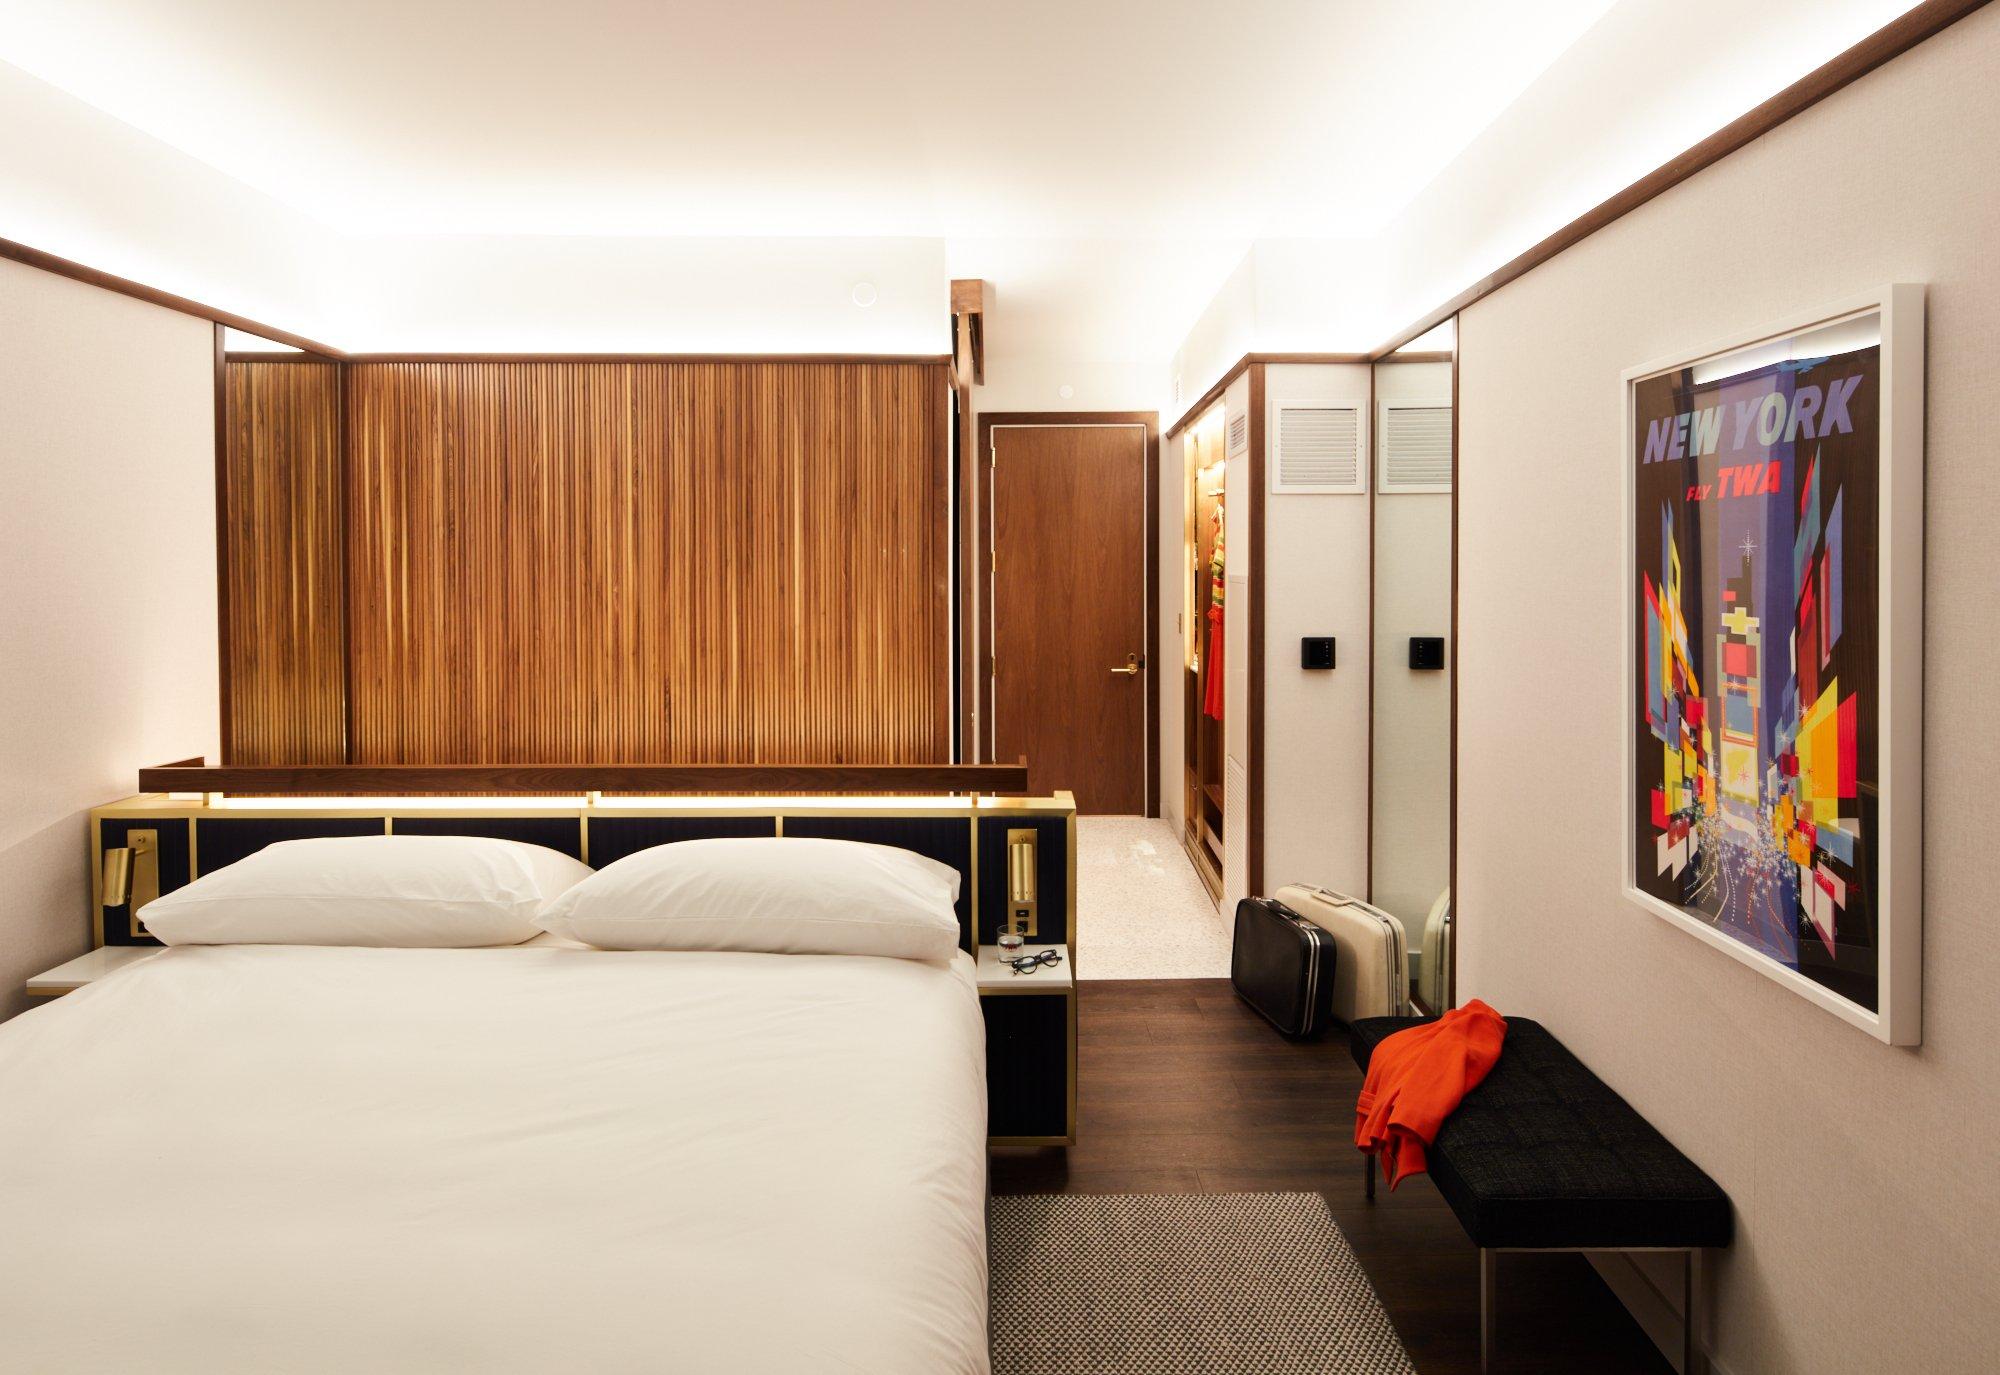 09 TWA Hotel Model Room